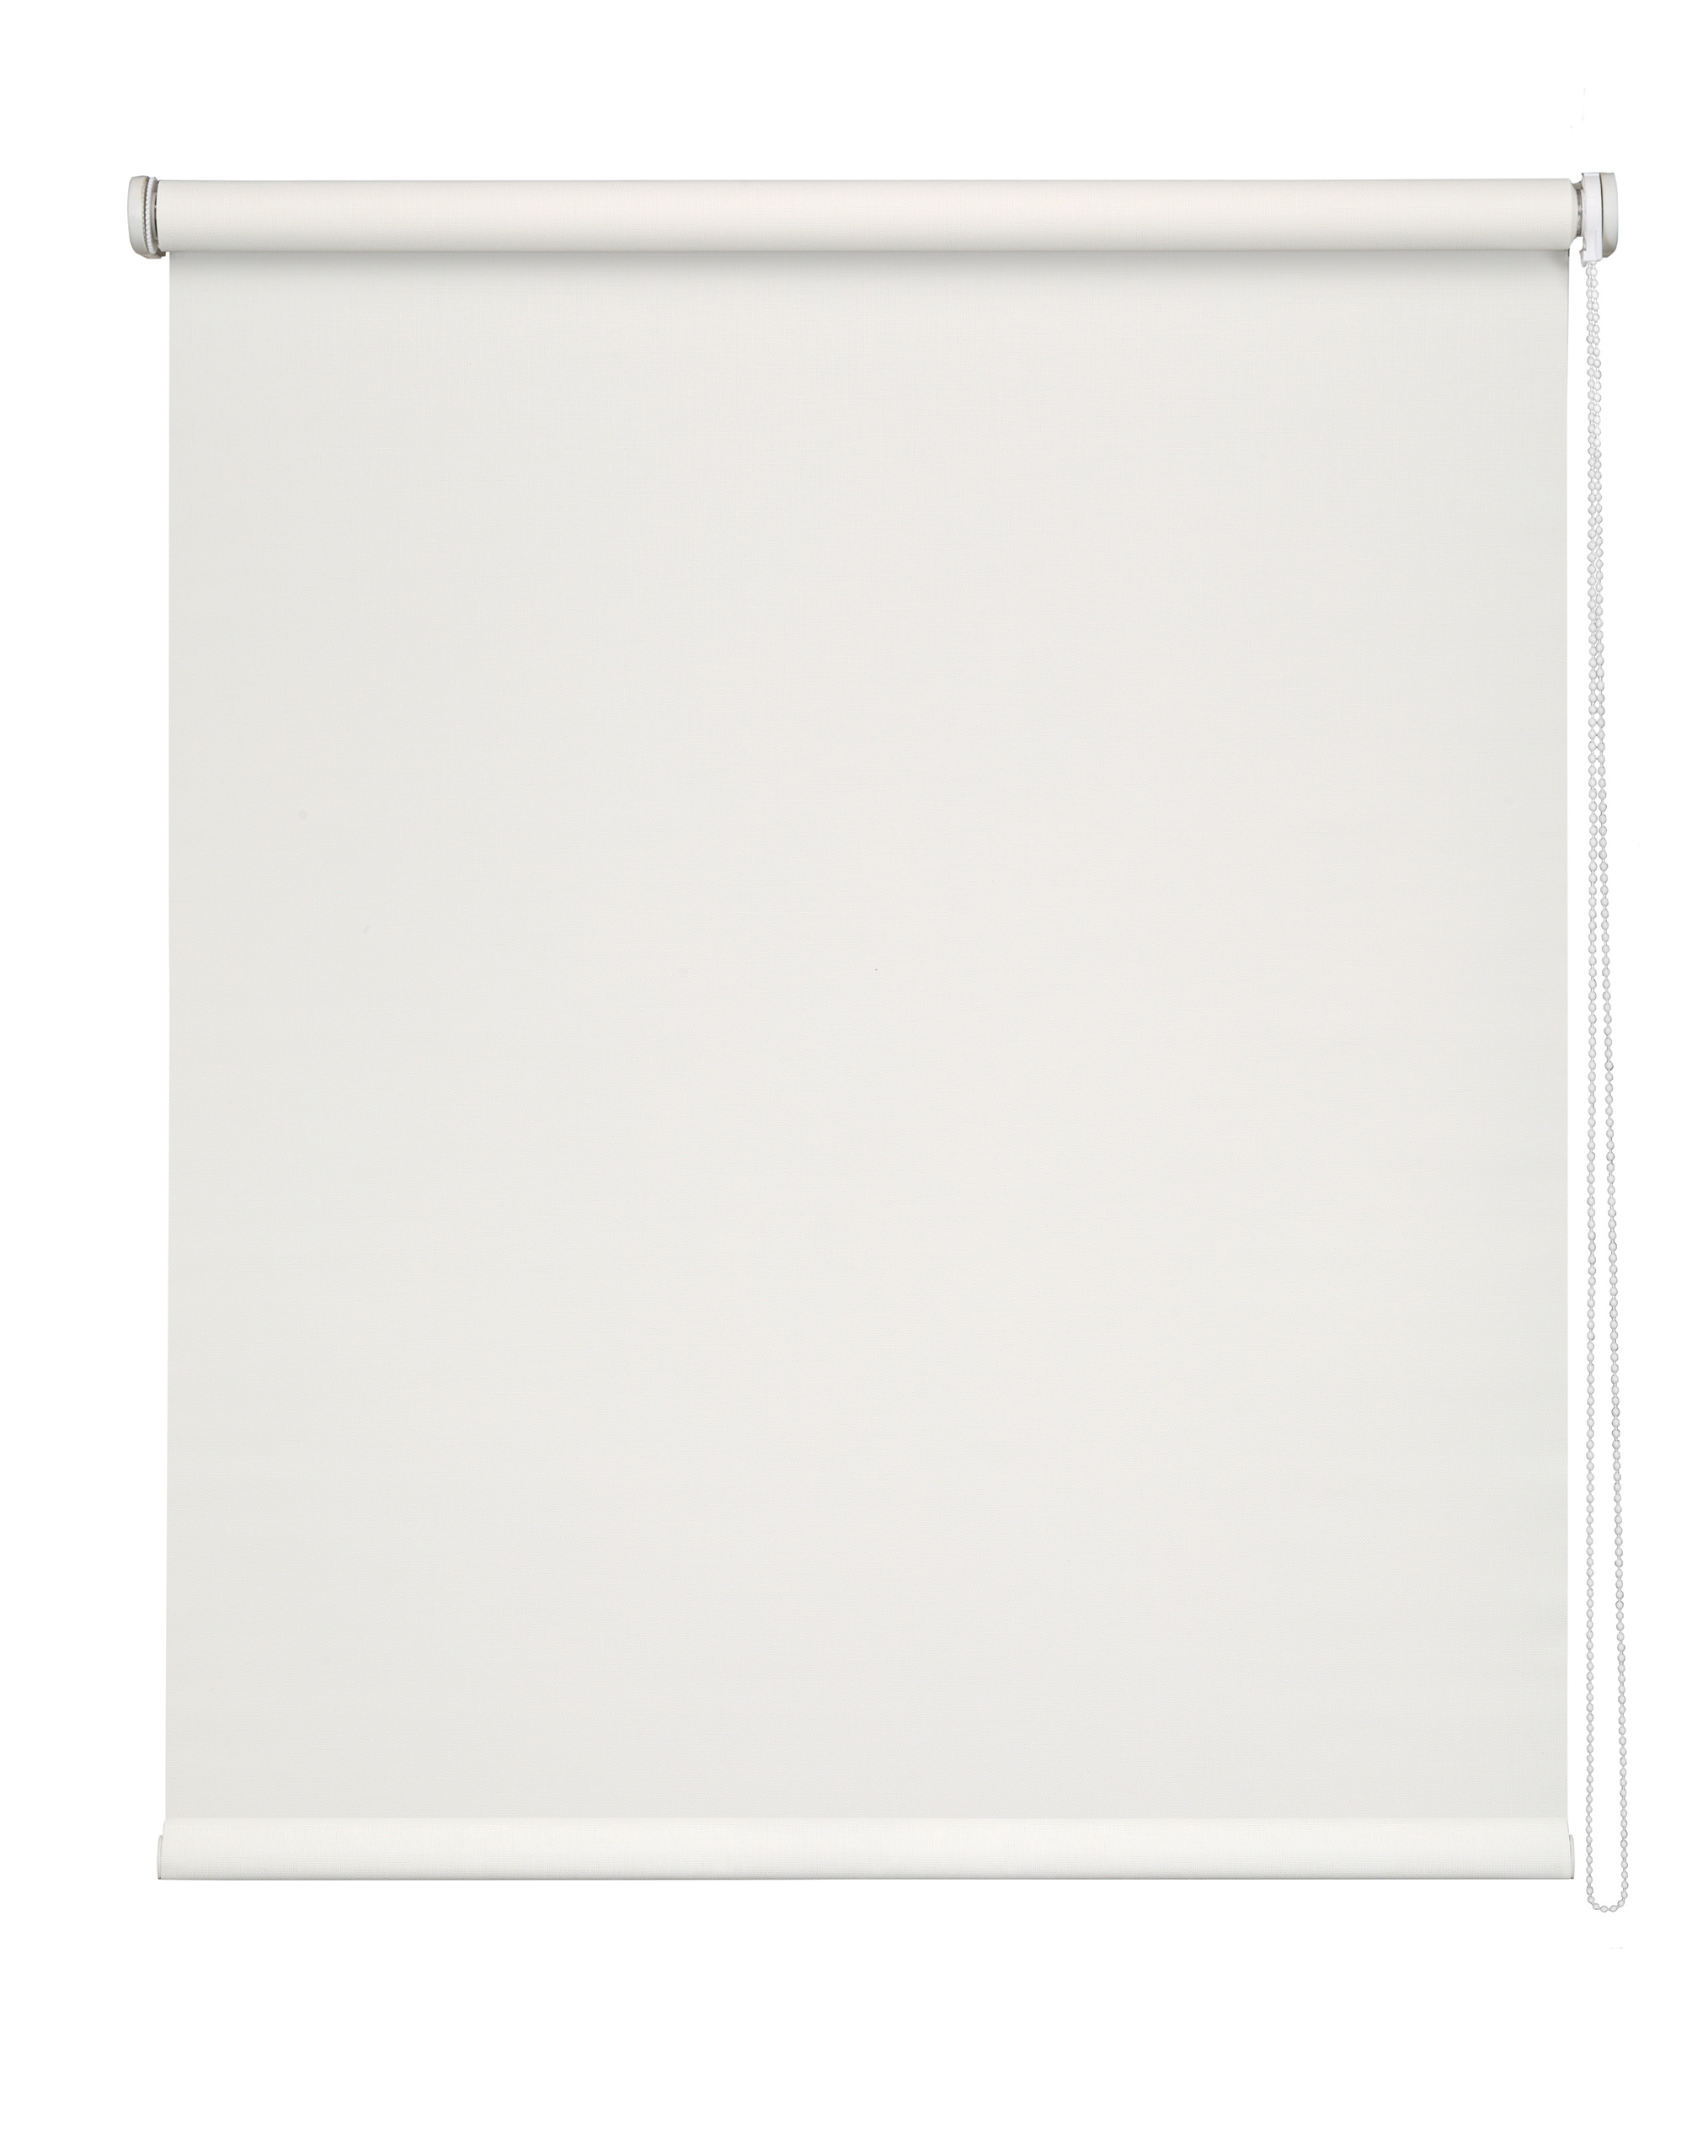 Store Enrouleur voile Screen - Blanc - 120 x 250 cm